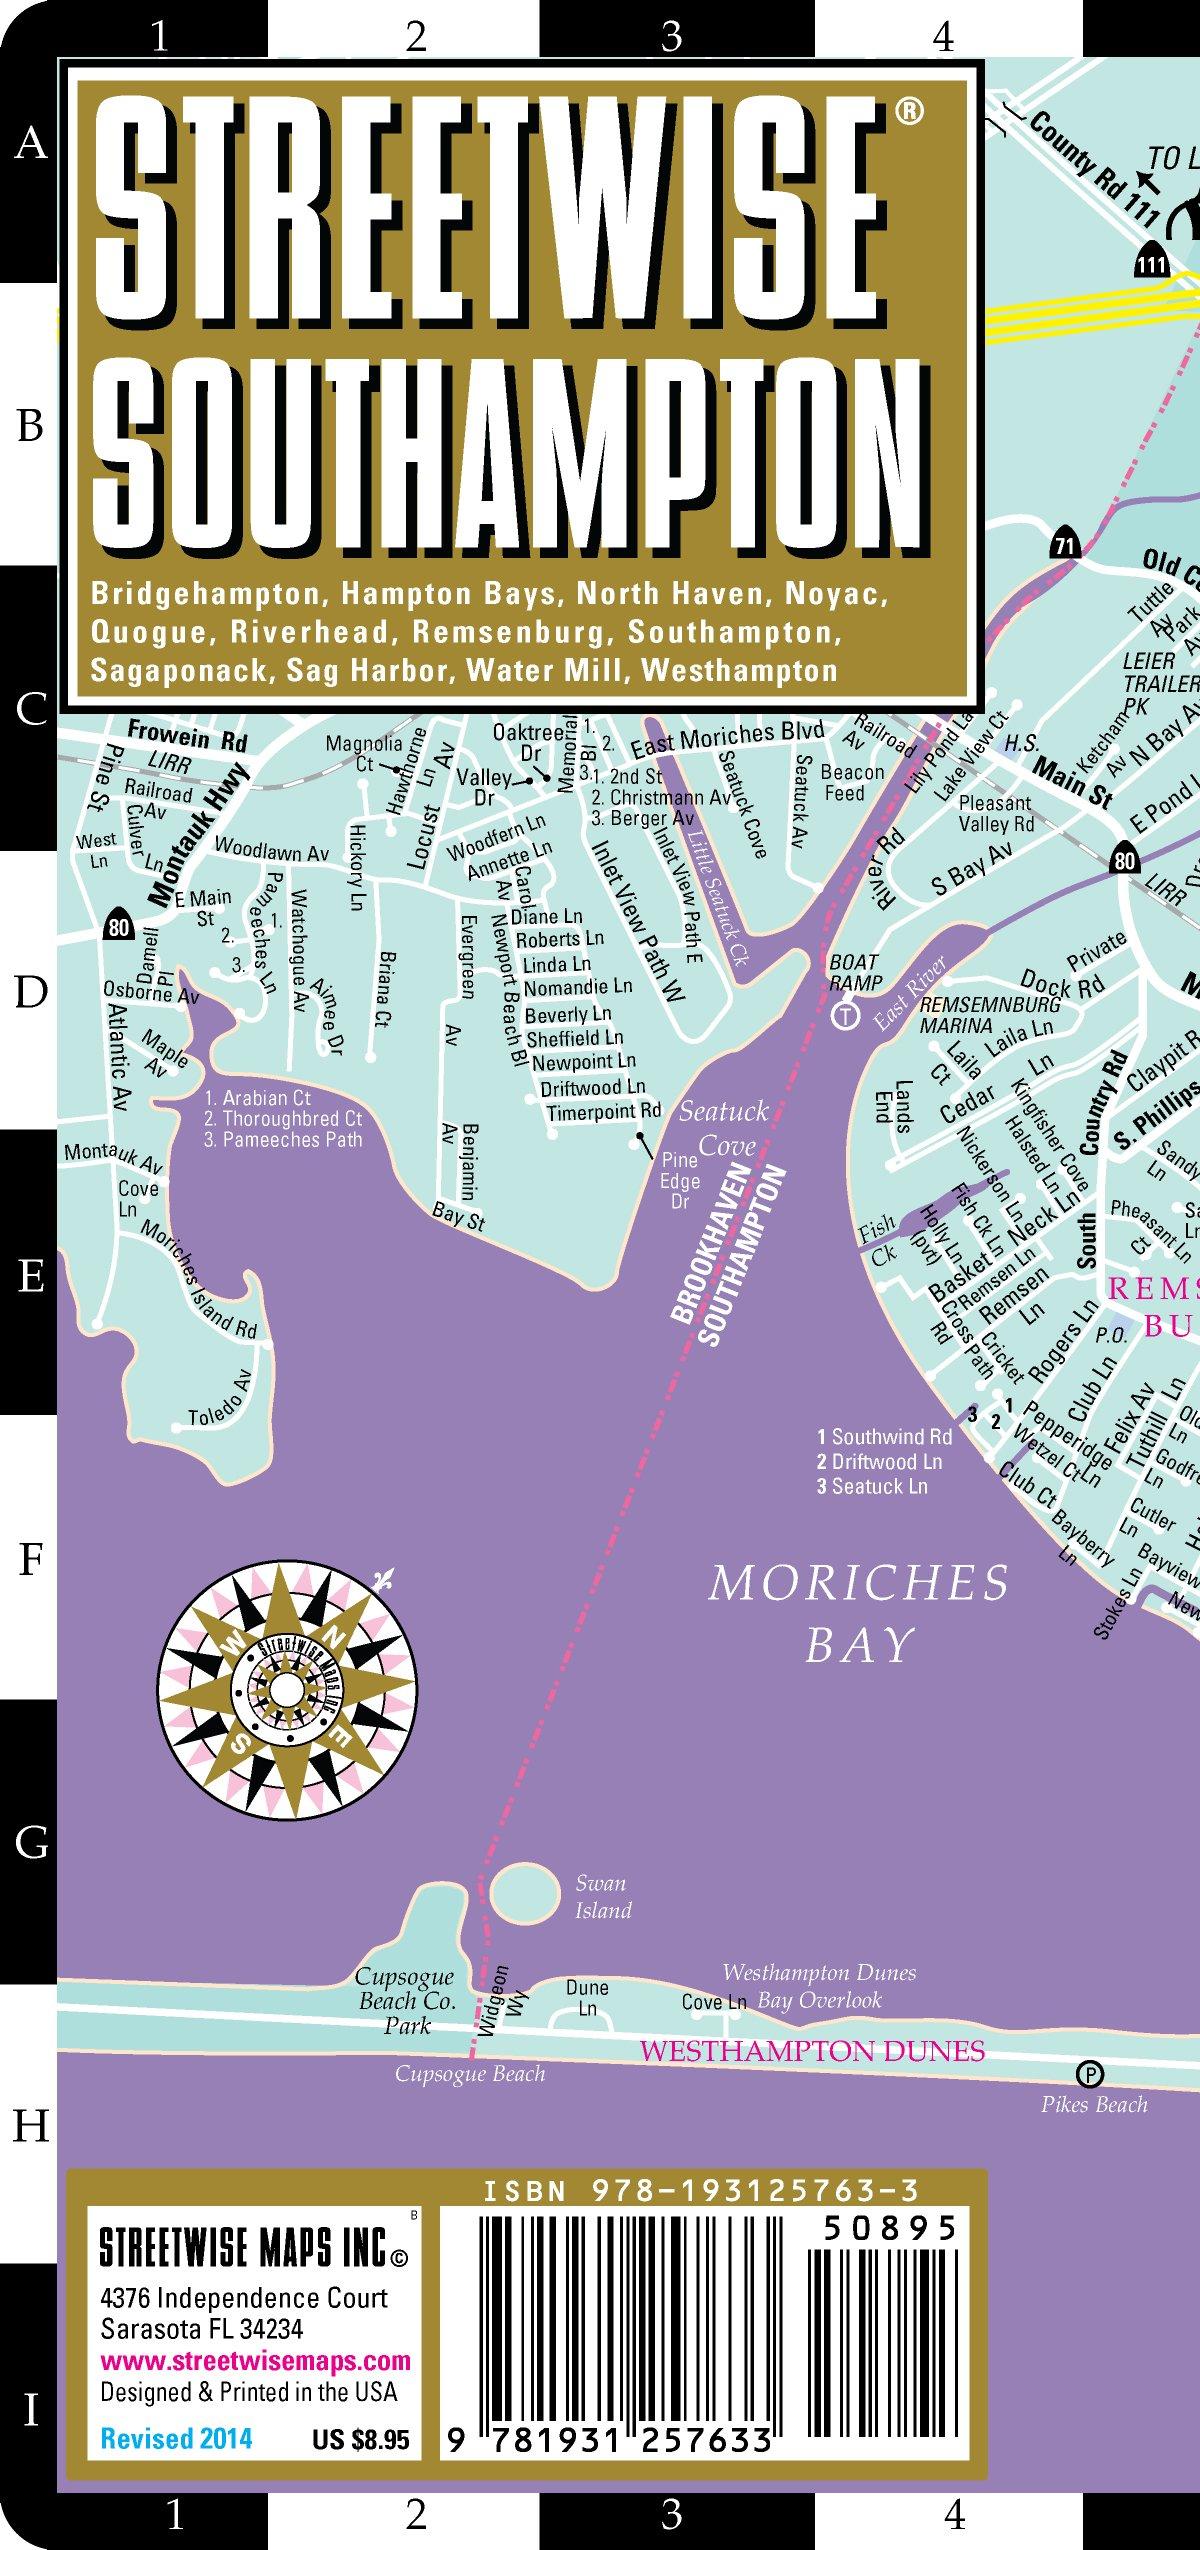 Streetwise Southampton Map Laminated City Street Map Of Southampton New York The Hamptons Streetwise Maps Inc 9781931257633 Amazon Com Books